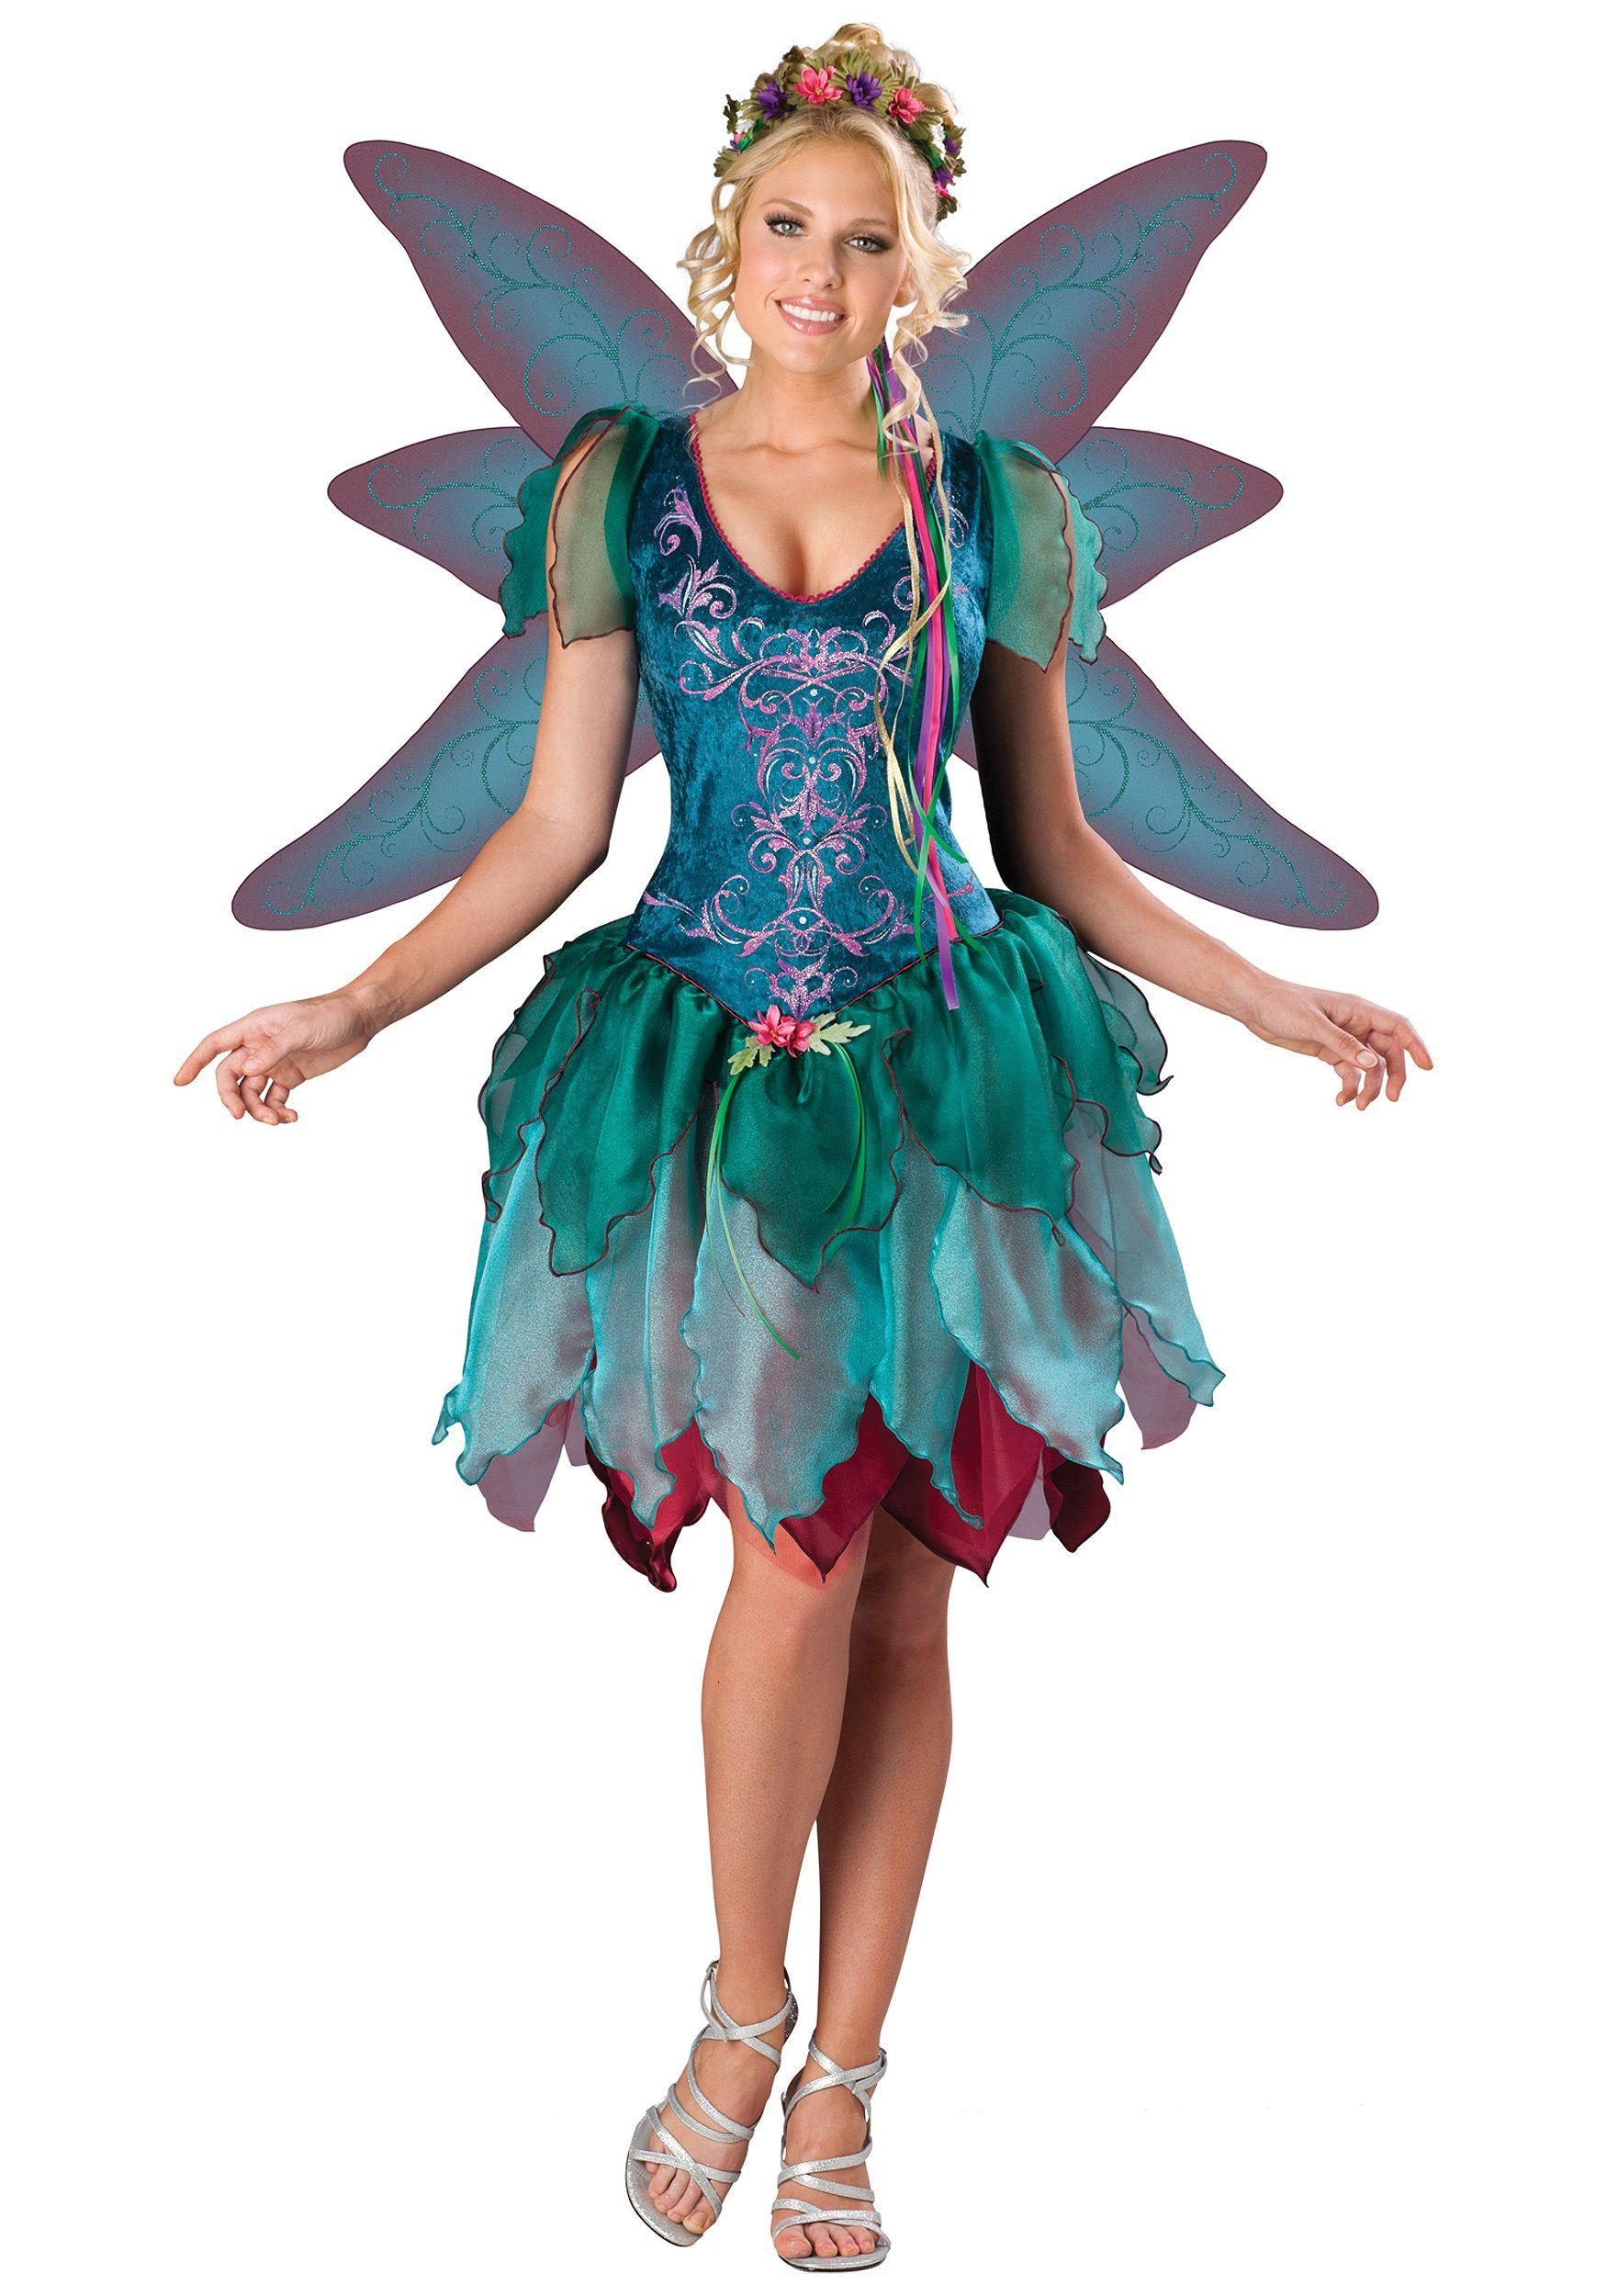 Purple Fairy Dresses for Women | Dress images